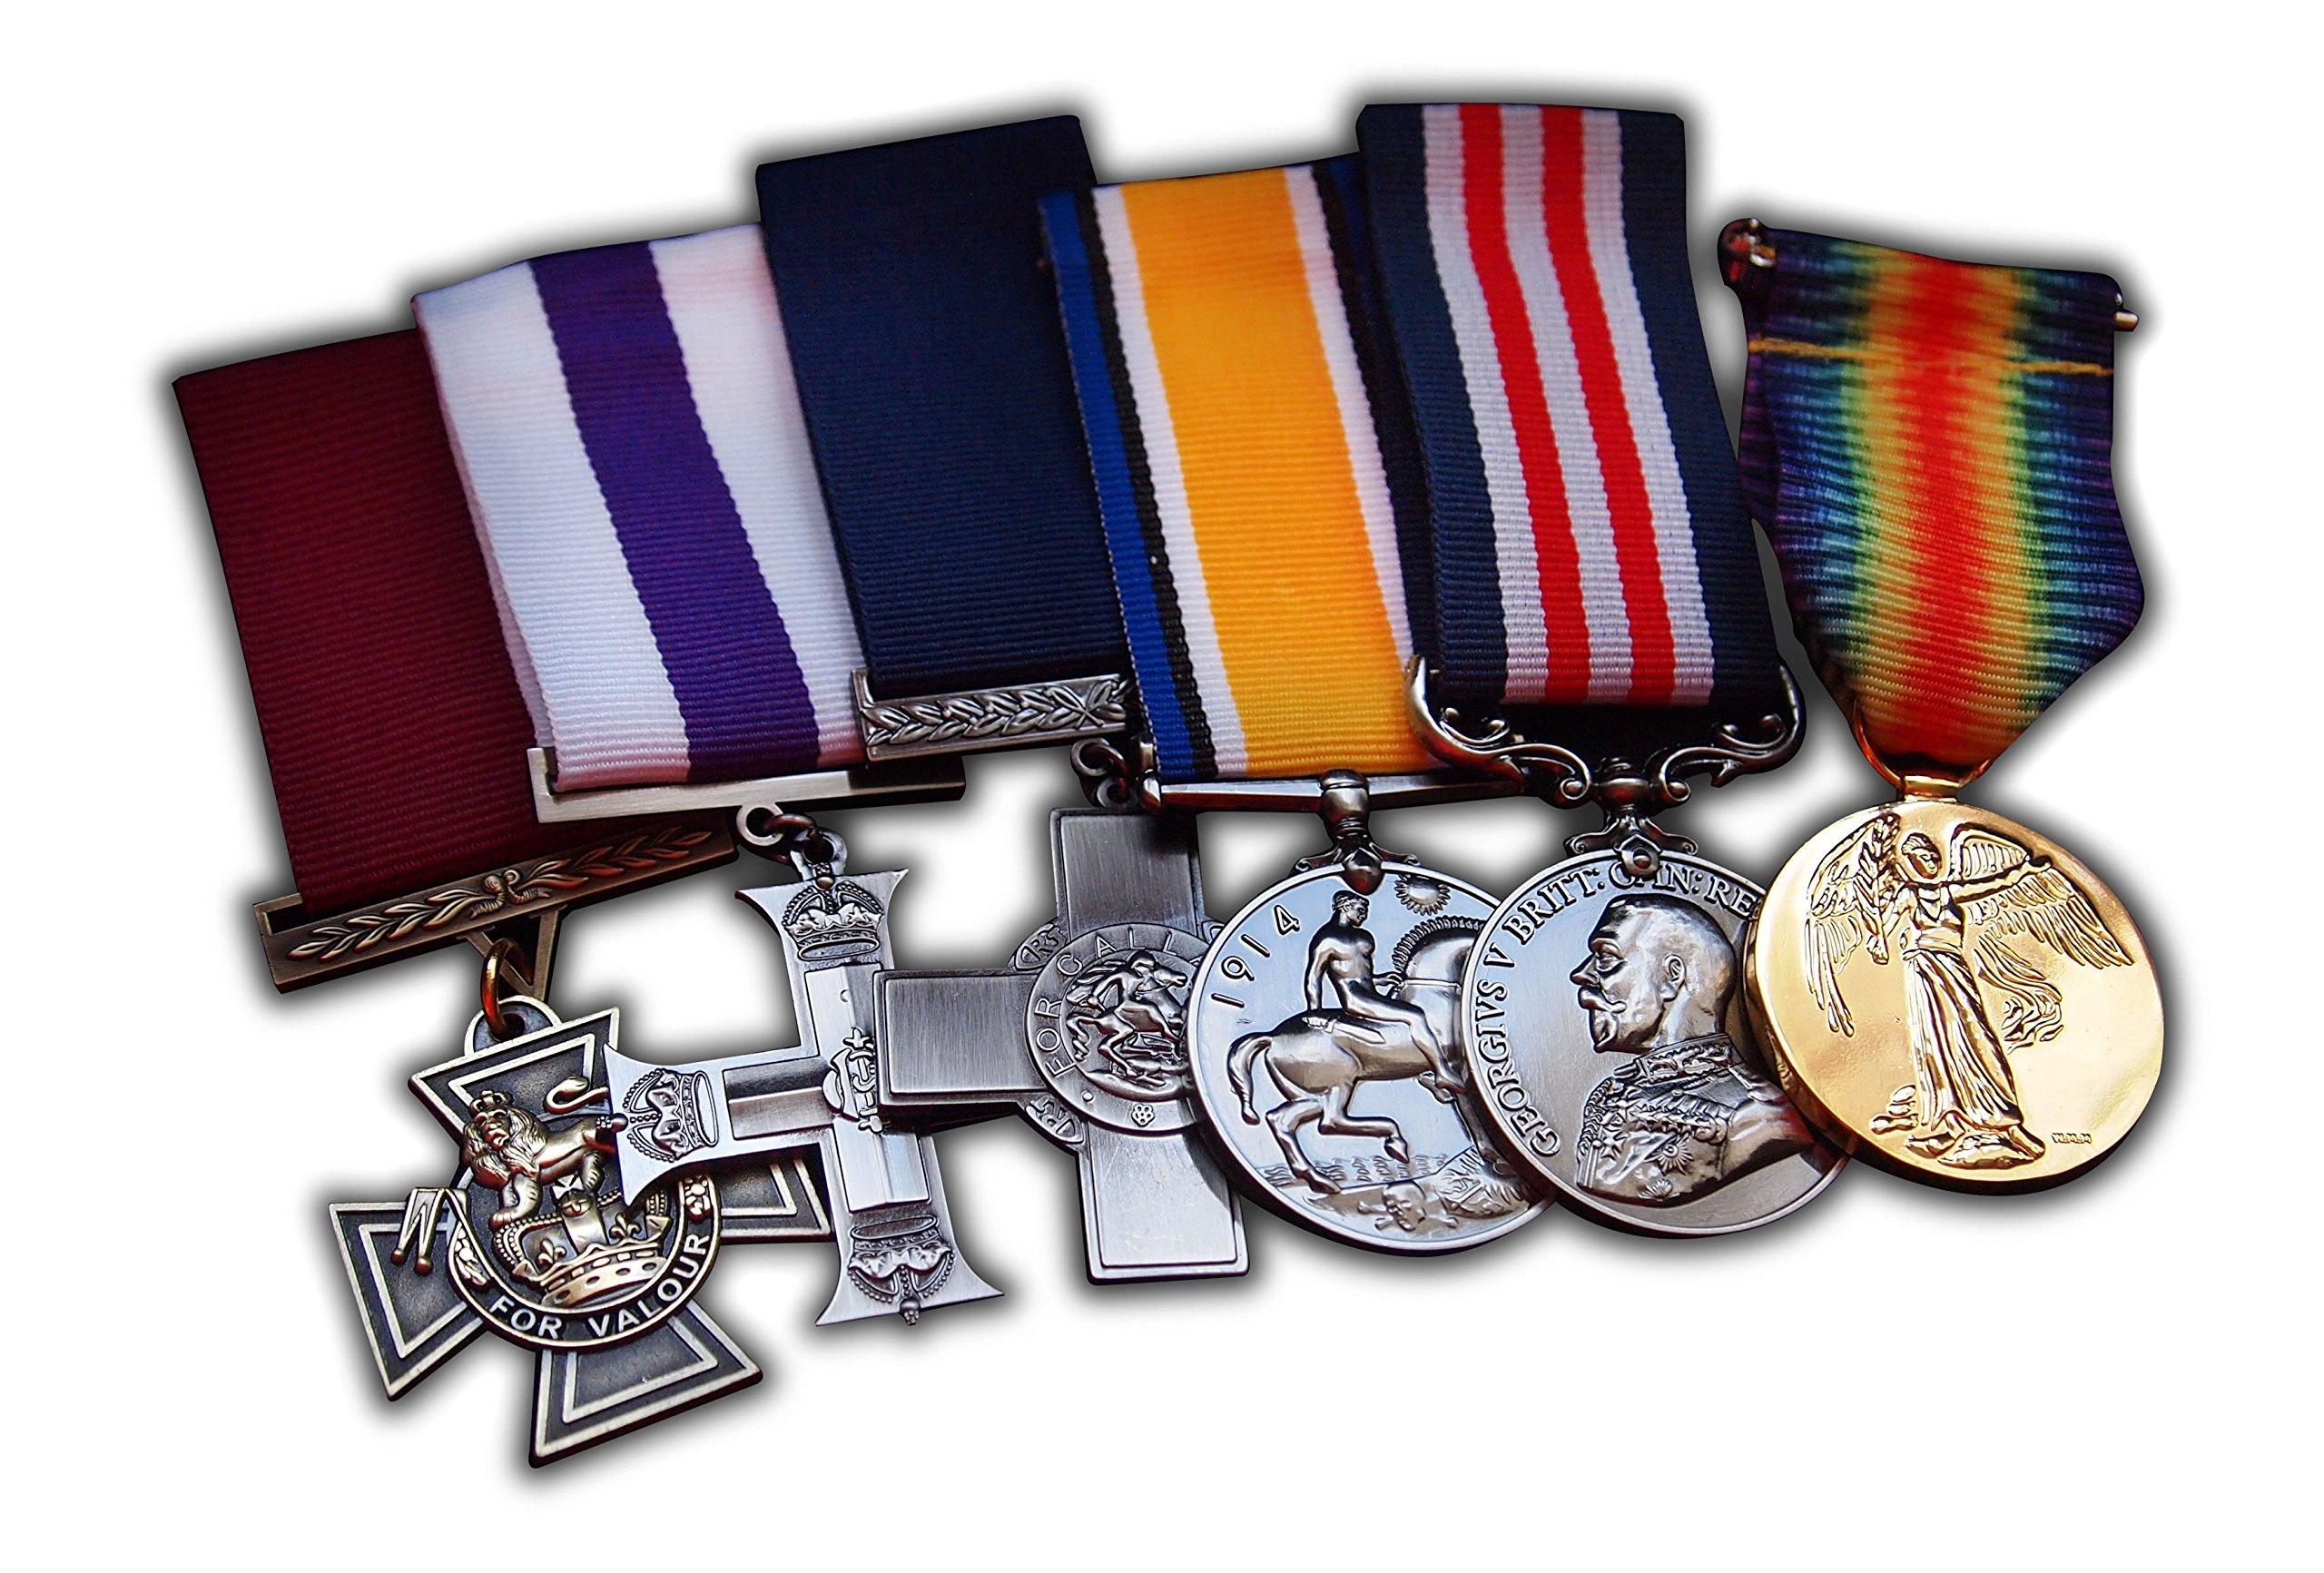 British Top Military Medal Group Set 6x Awards For | RAF | NAVY | RM | SBS | PARA | ARMY | PARA